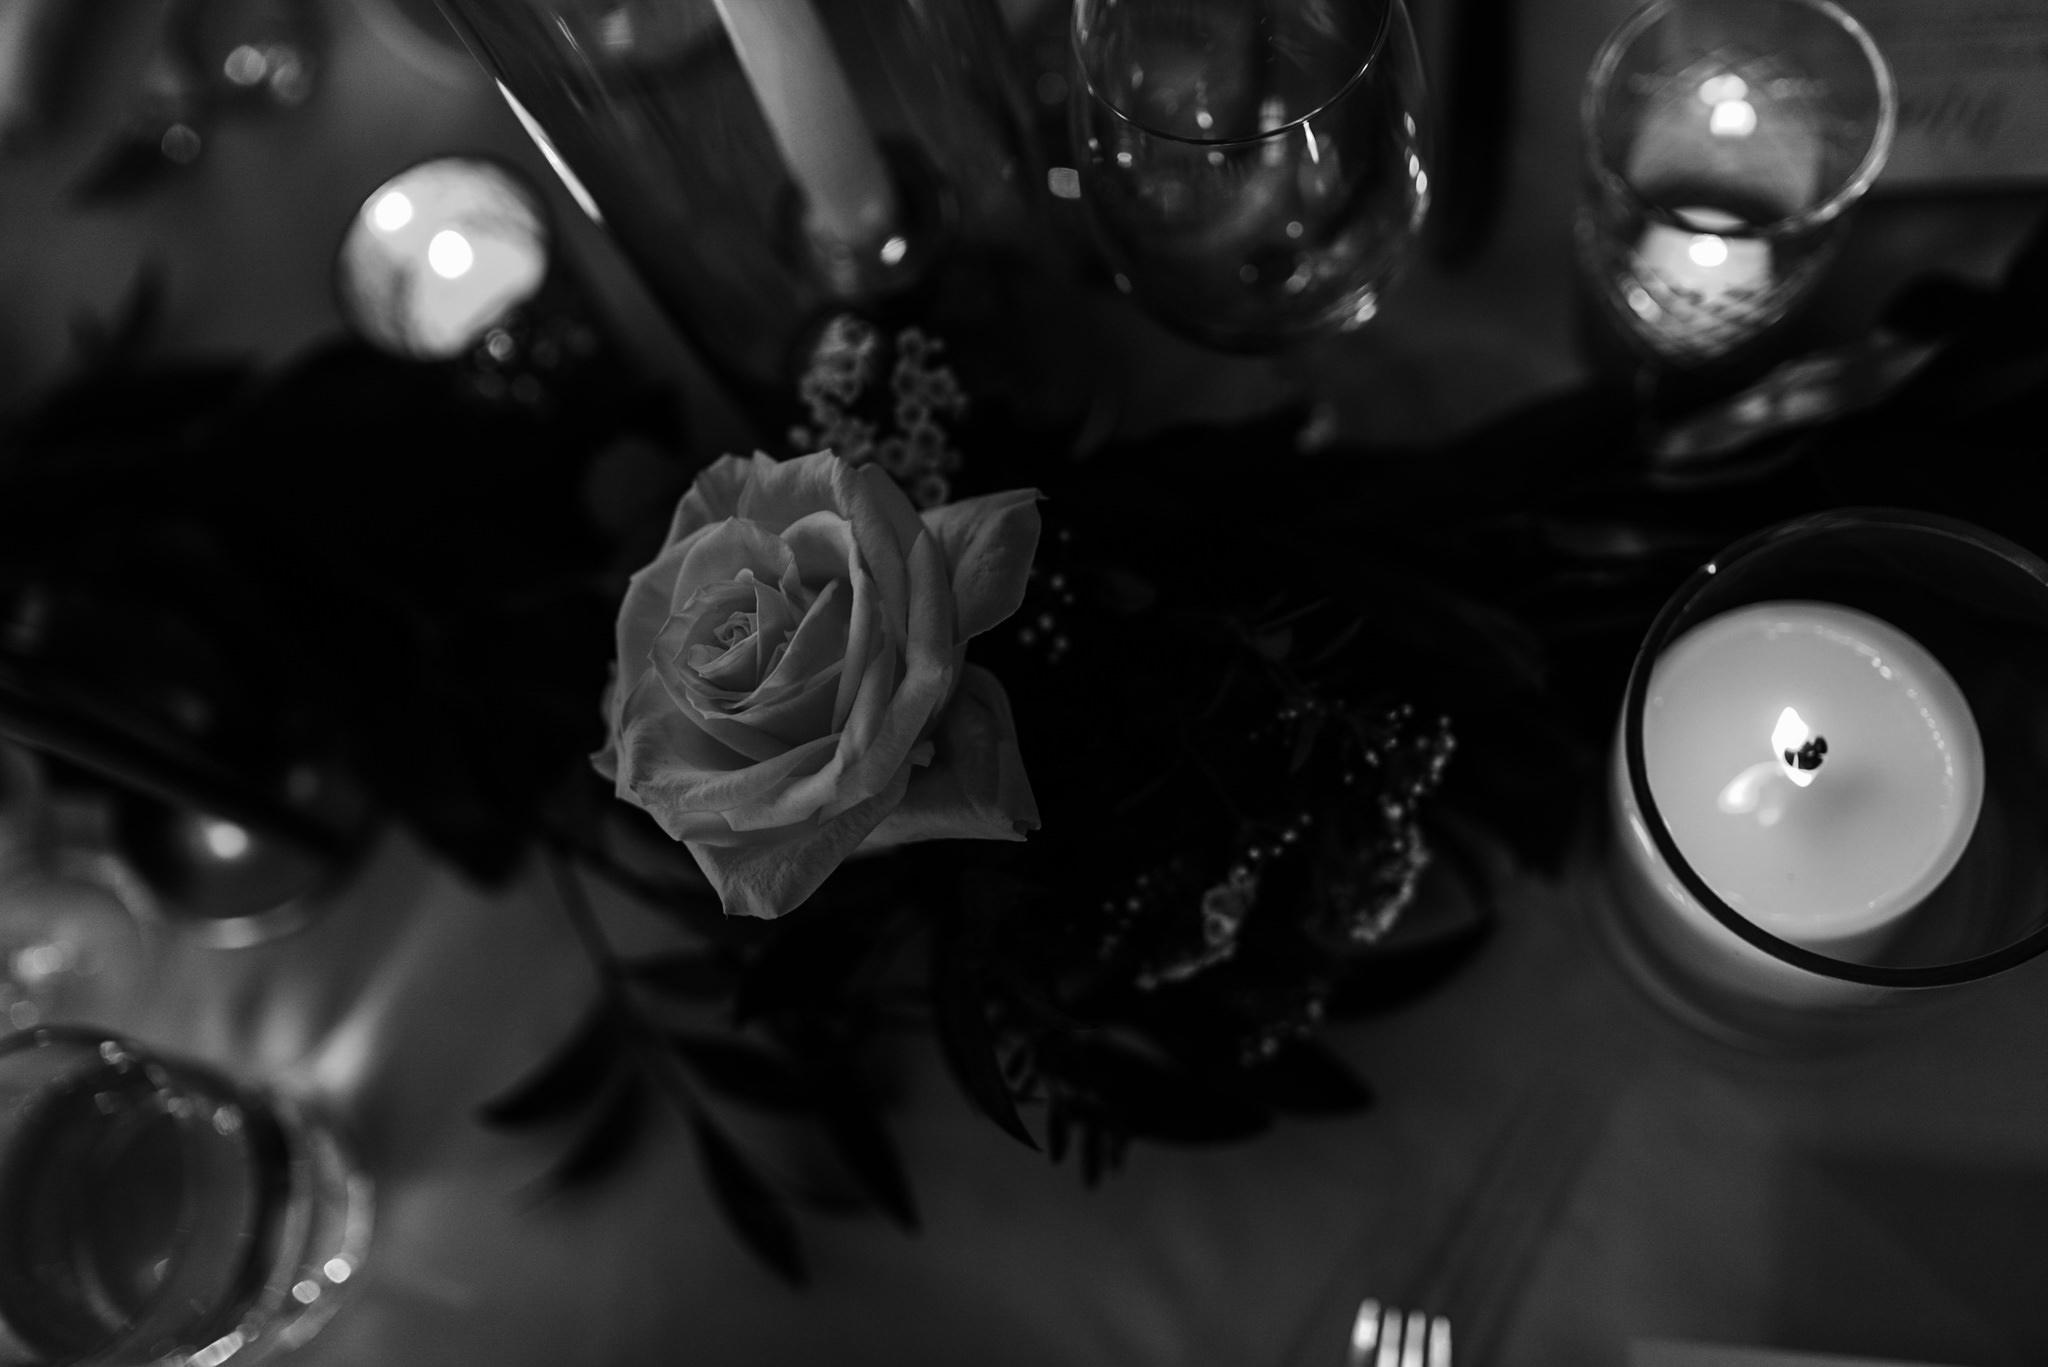 082-reception-decor-romantic-candles-storys-building-industrial.jpg